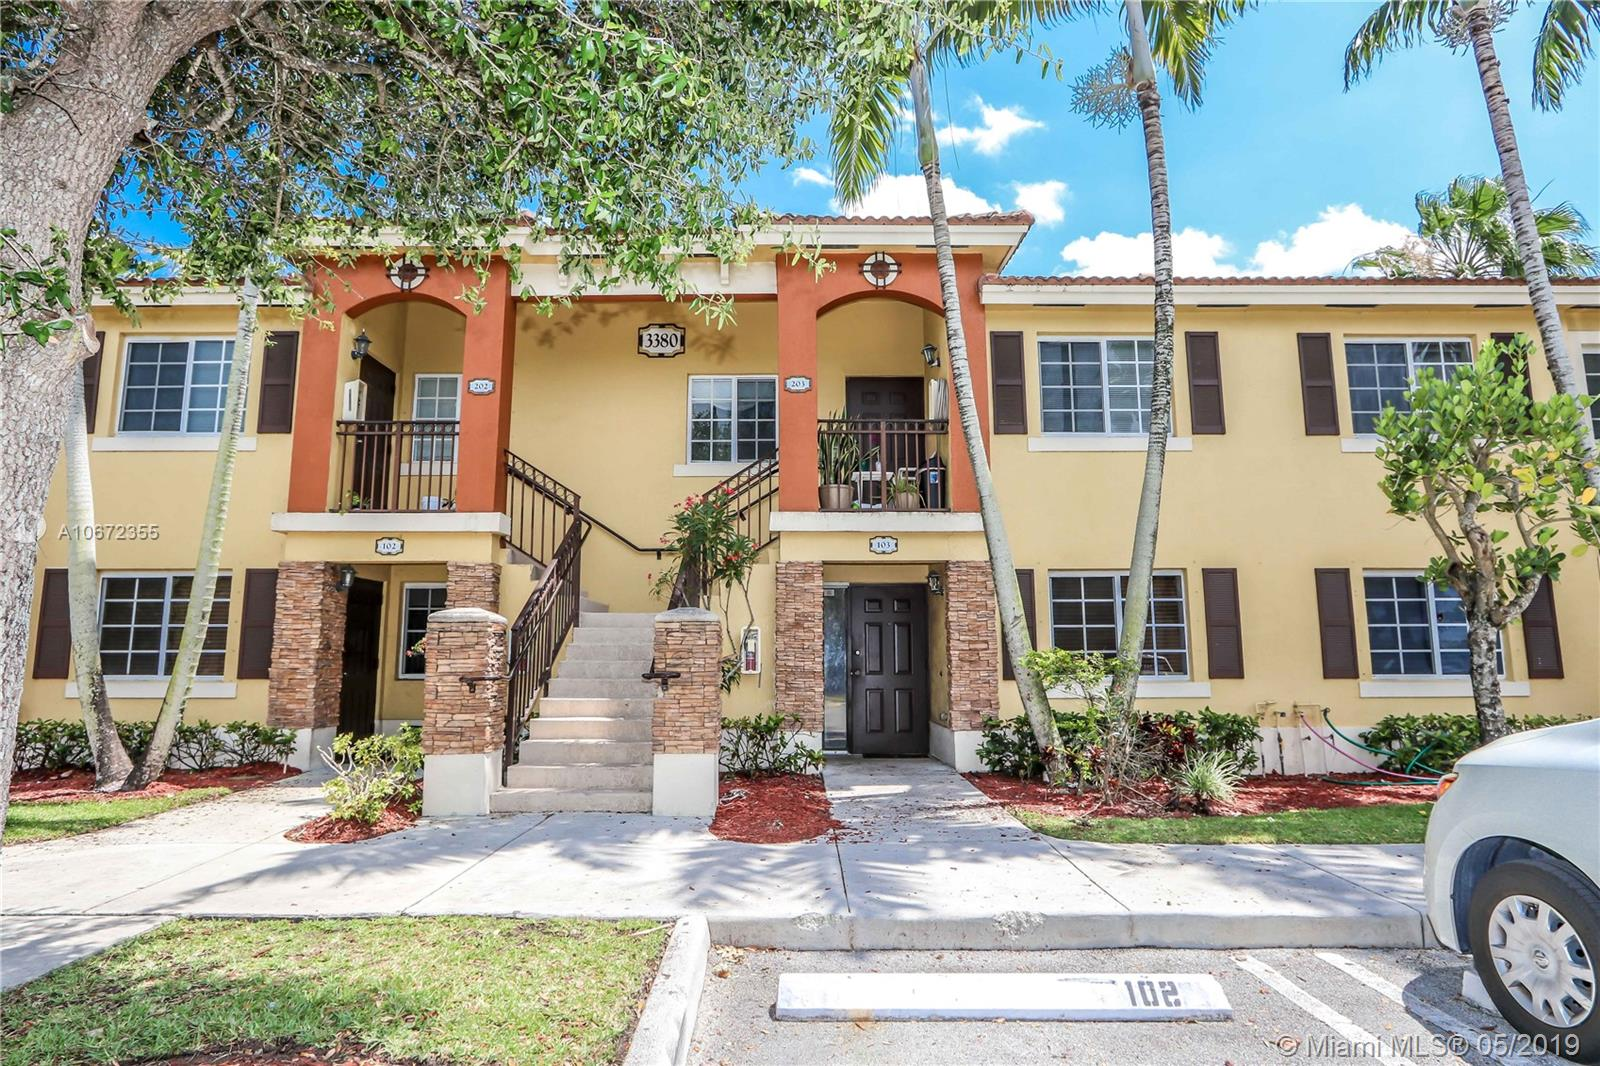 3380 NE 9th St #203, Homestead, FL 33033 - Homestead, FL real estate listing